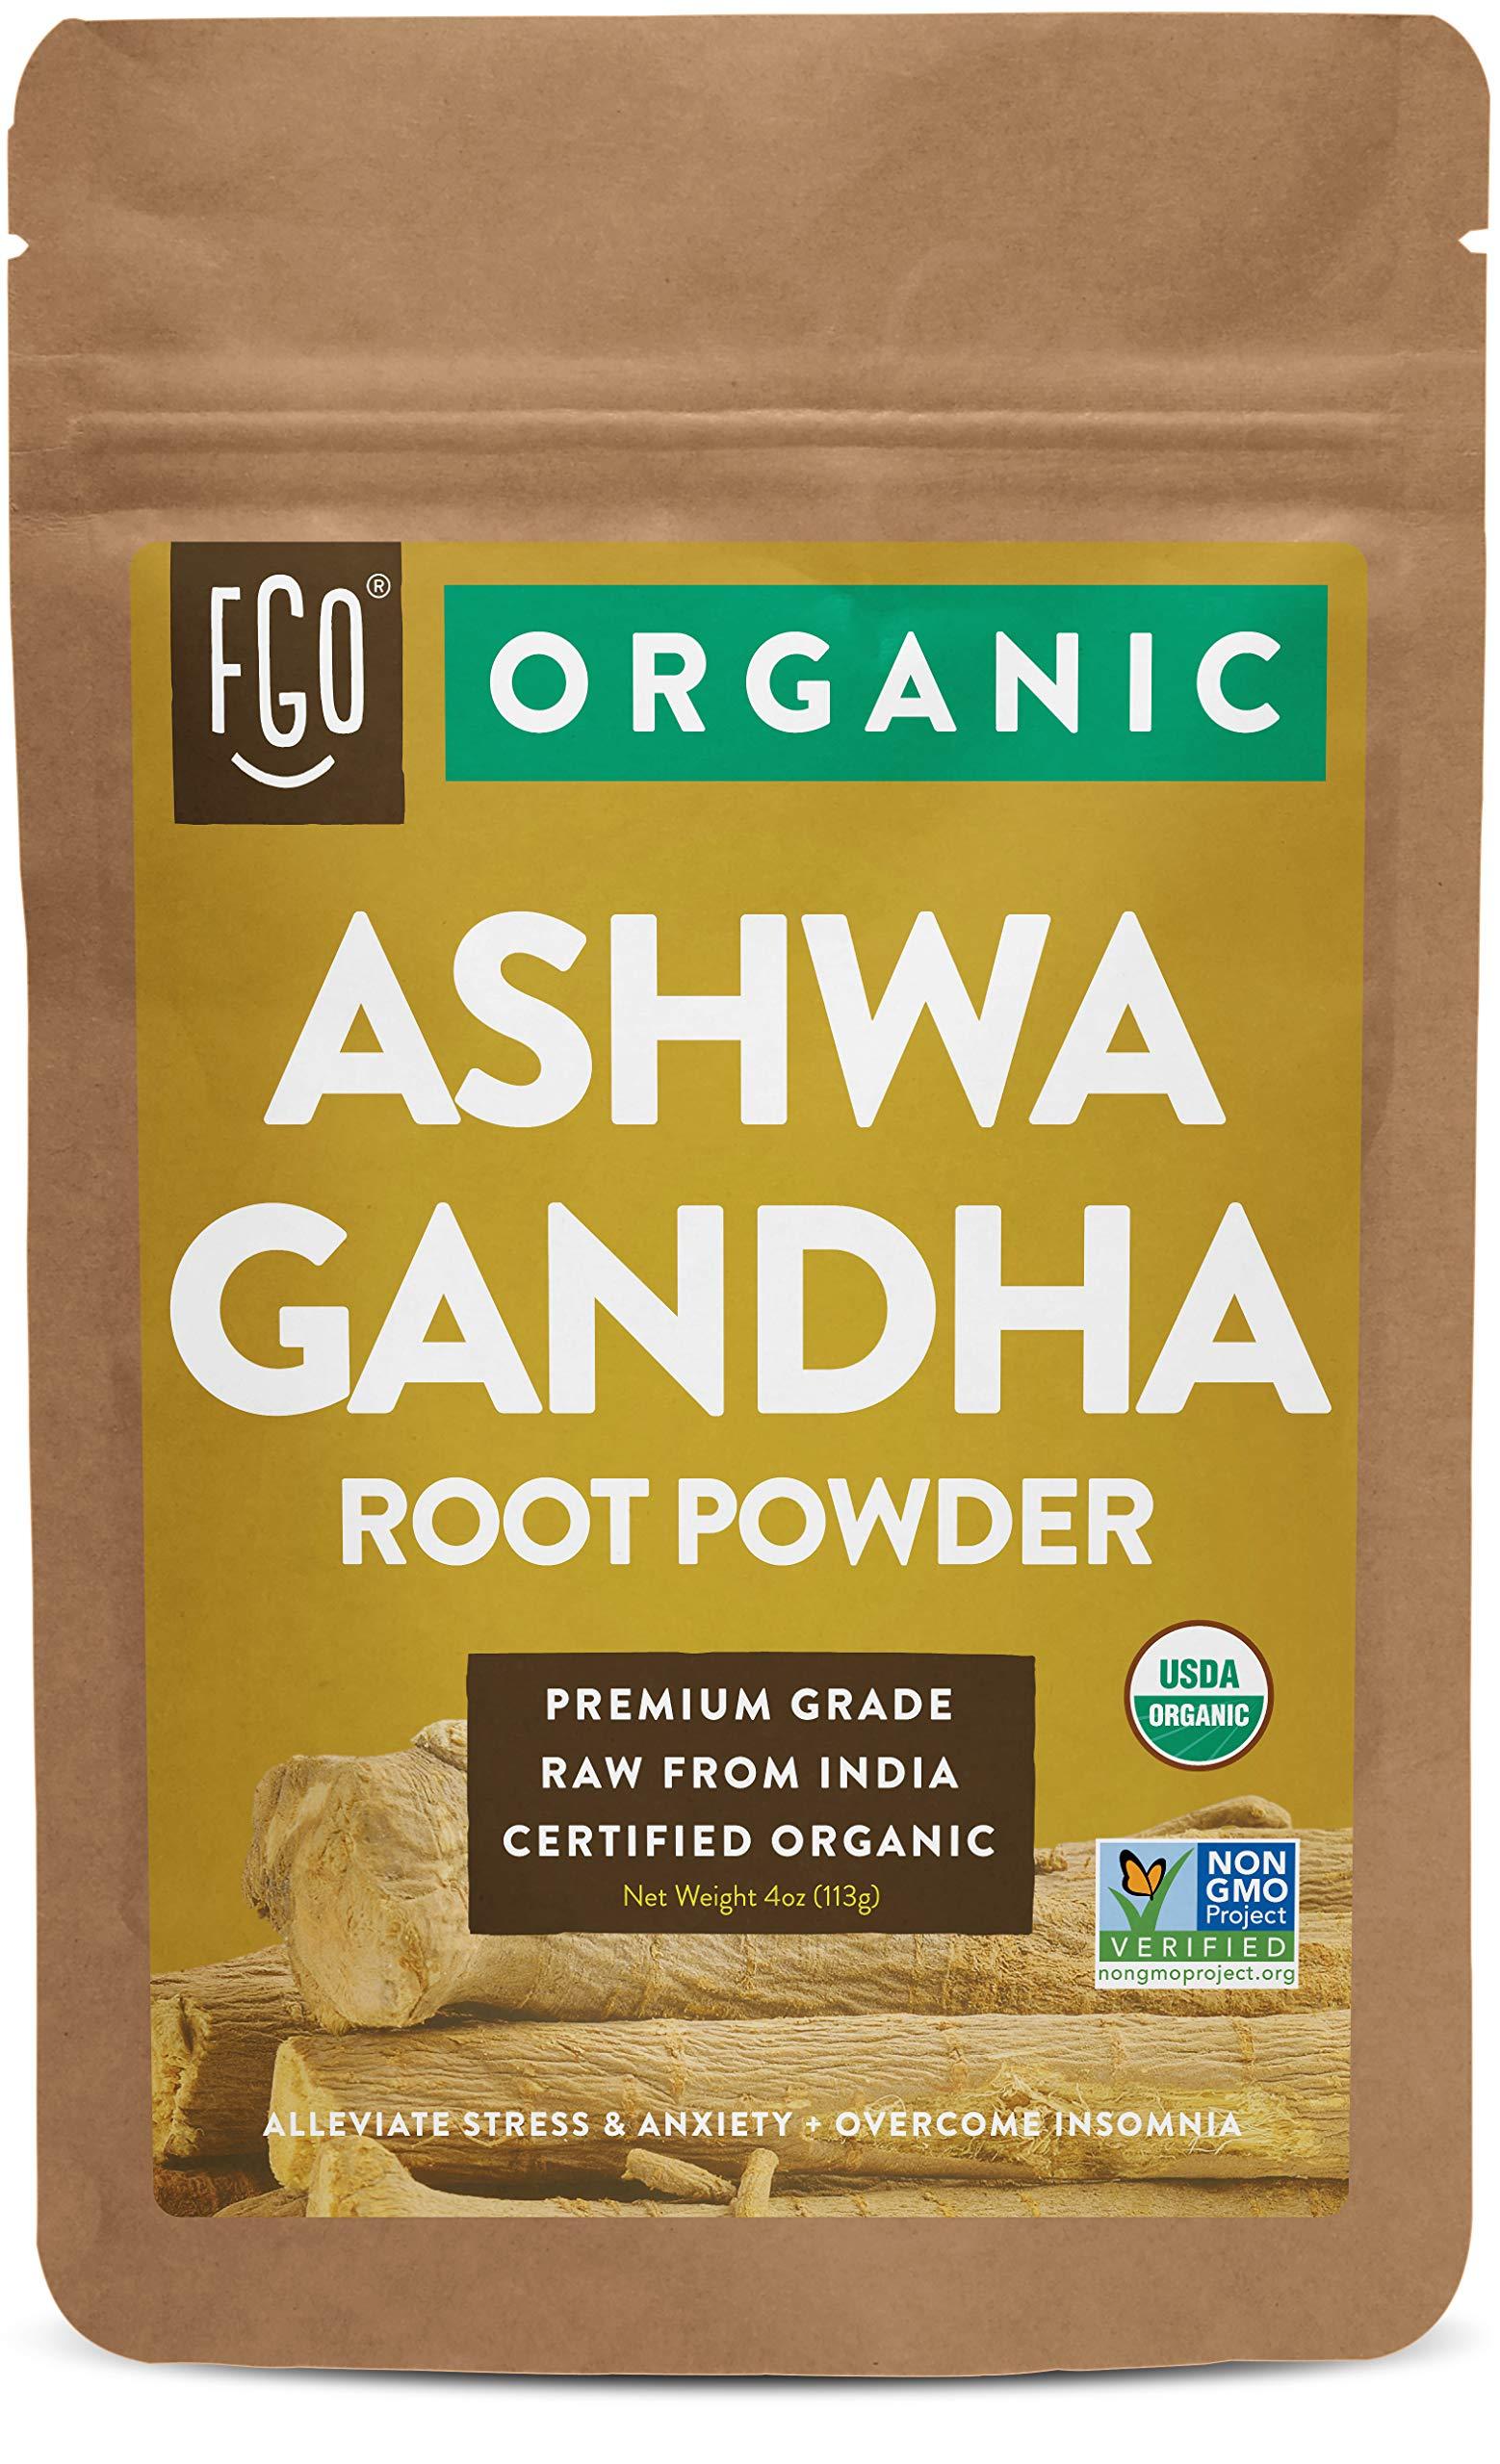 Organic Ashwagandha Root Powder | 4oz Resealable Kraft Bag | 100% Raw From India | by FGO